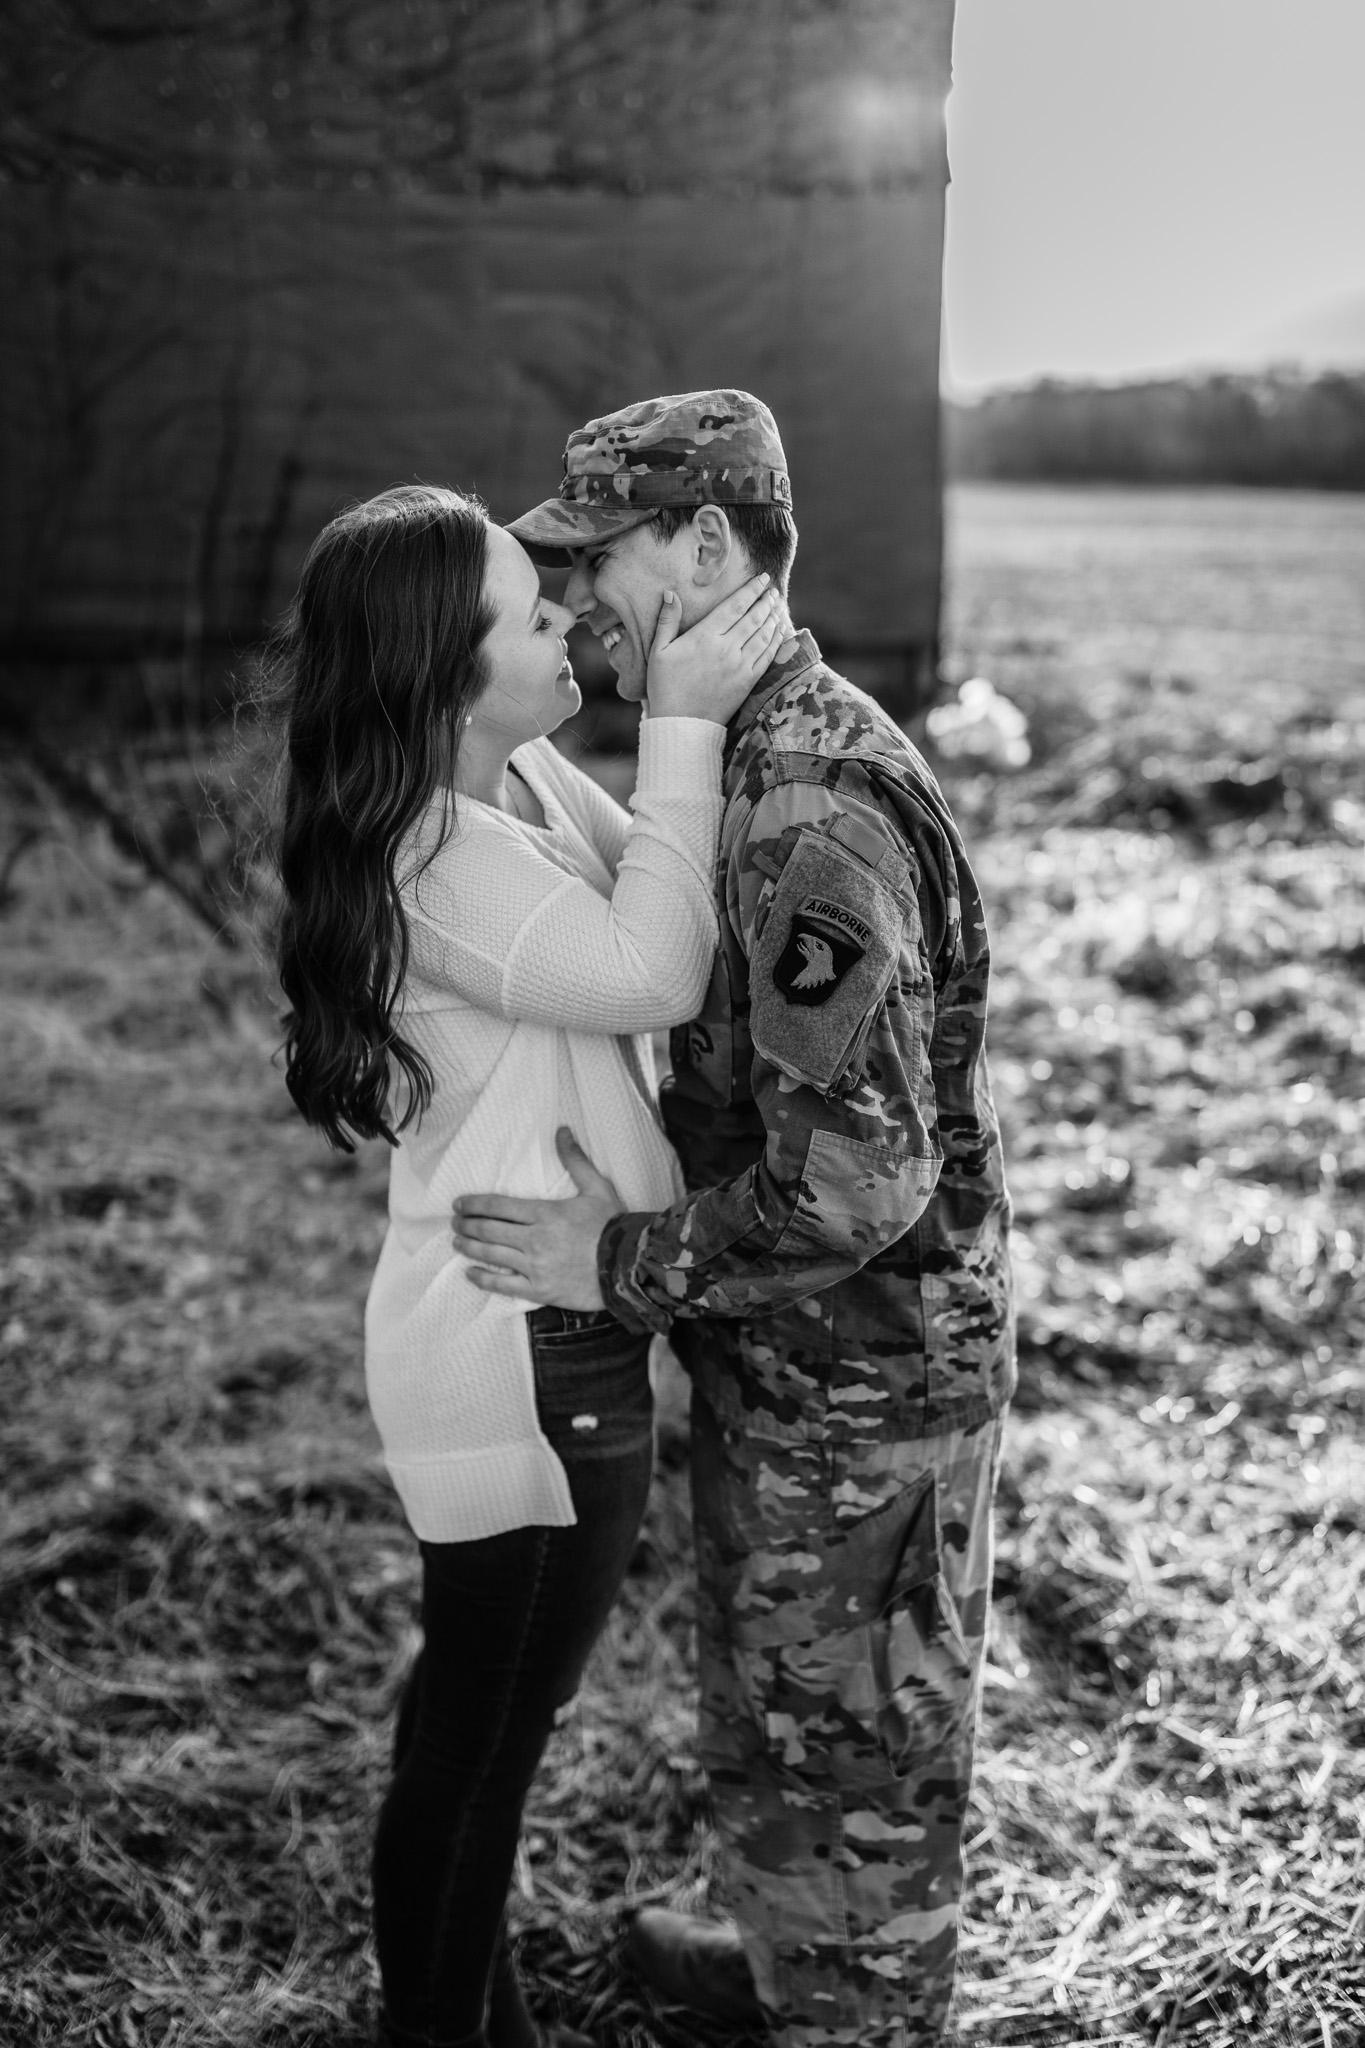 army man in uniform kissing girl